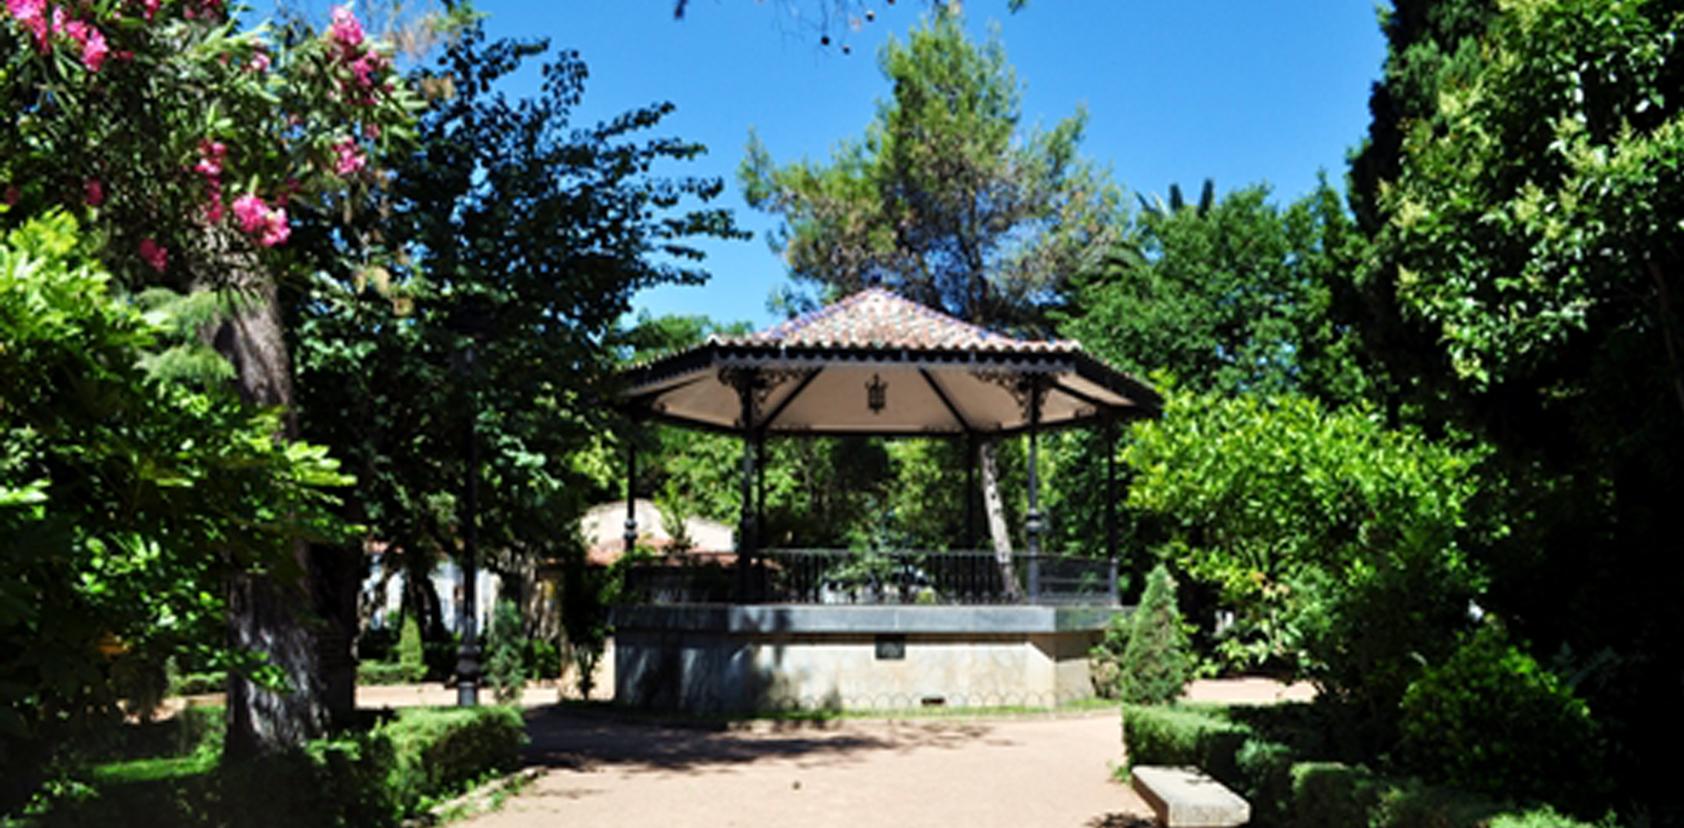 Homenaje a Extremadura 2020